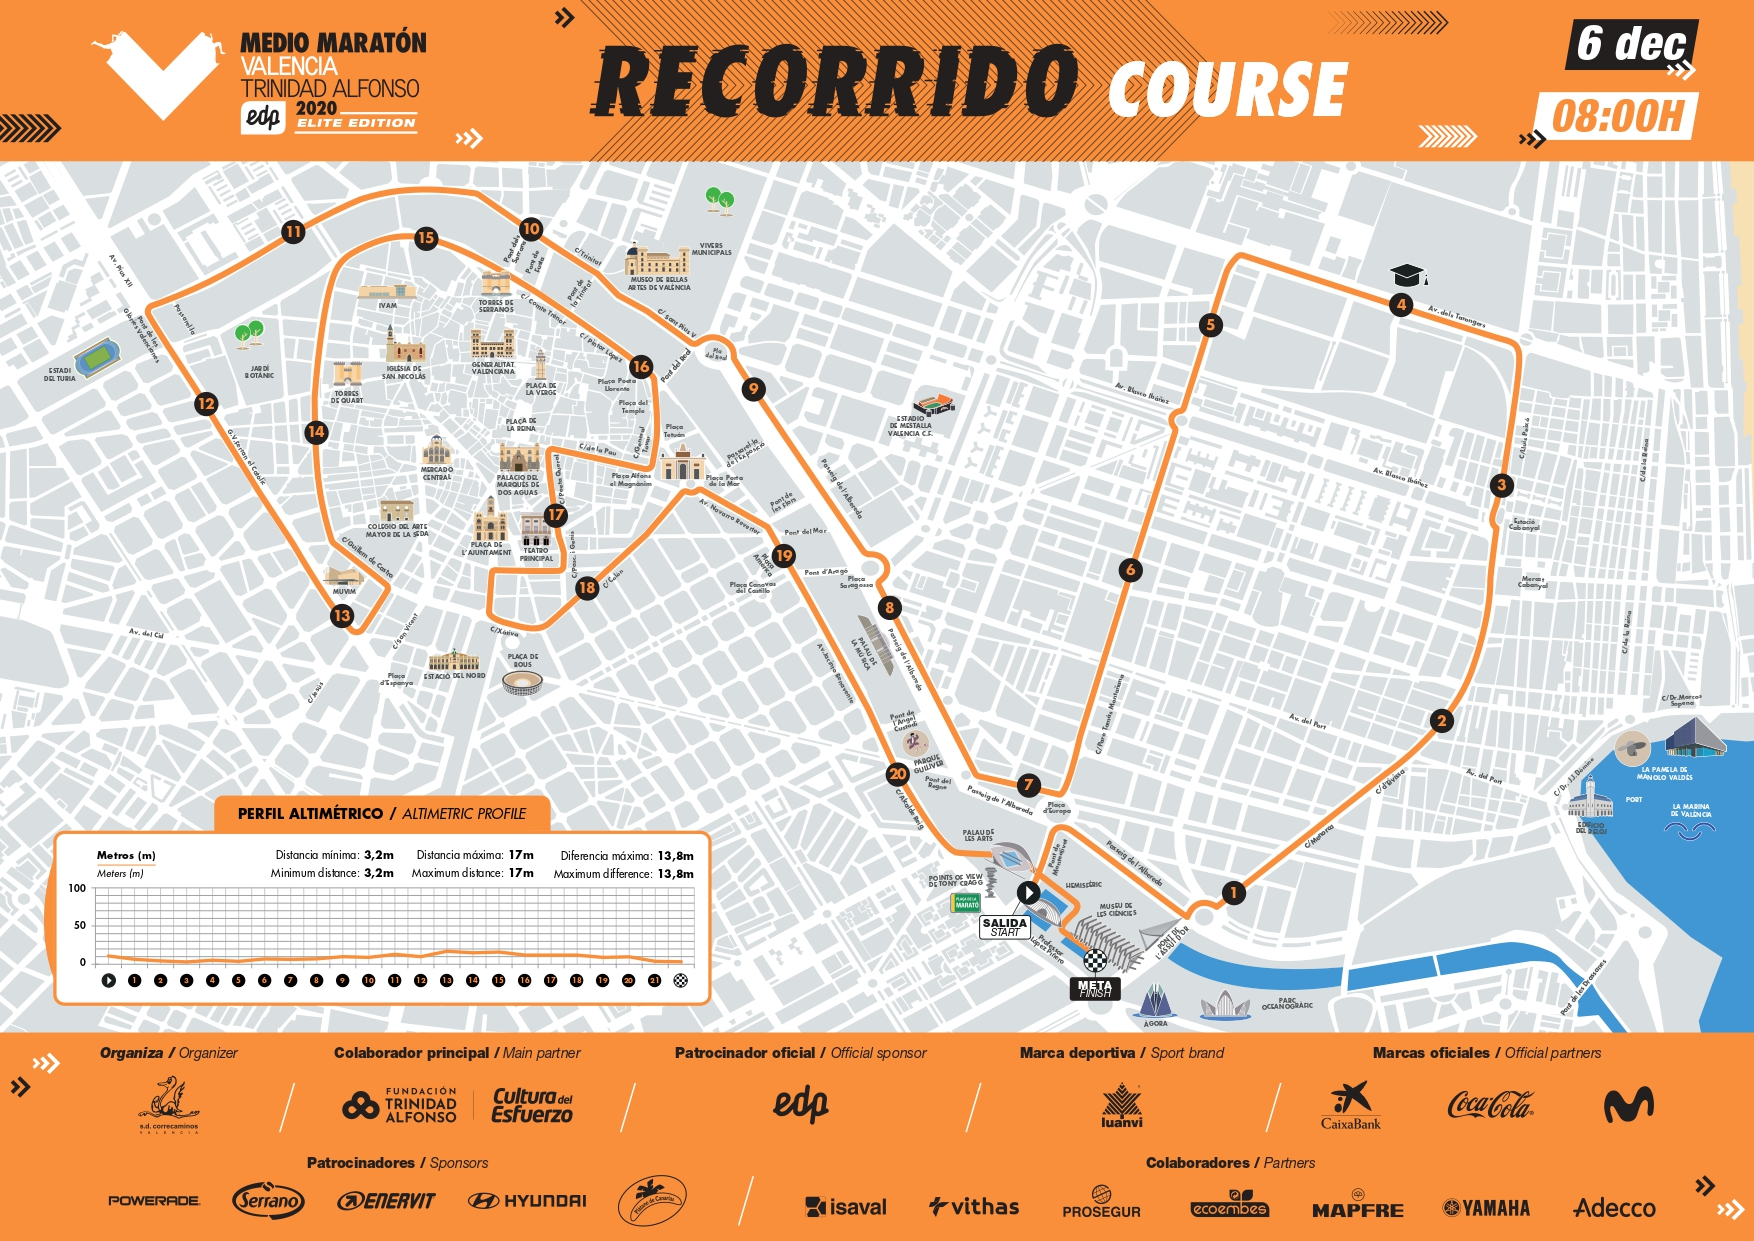 plano mapa medio maraton valencia 2020